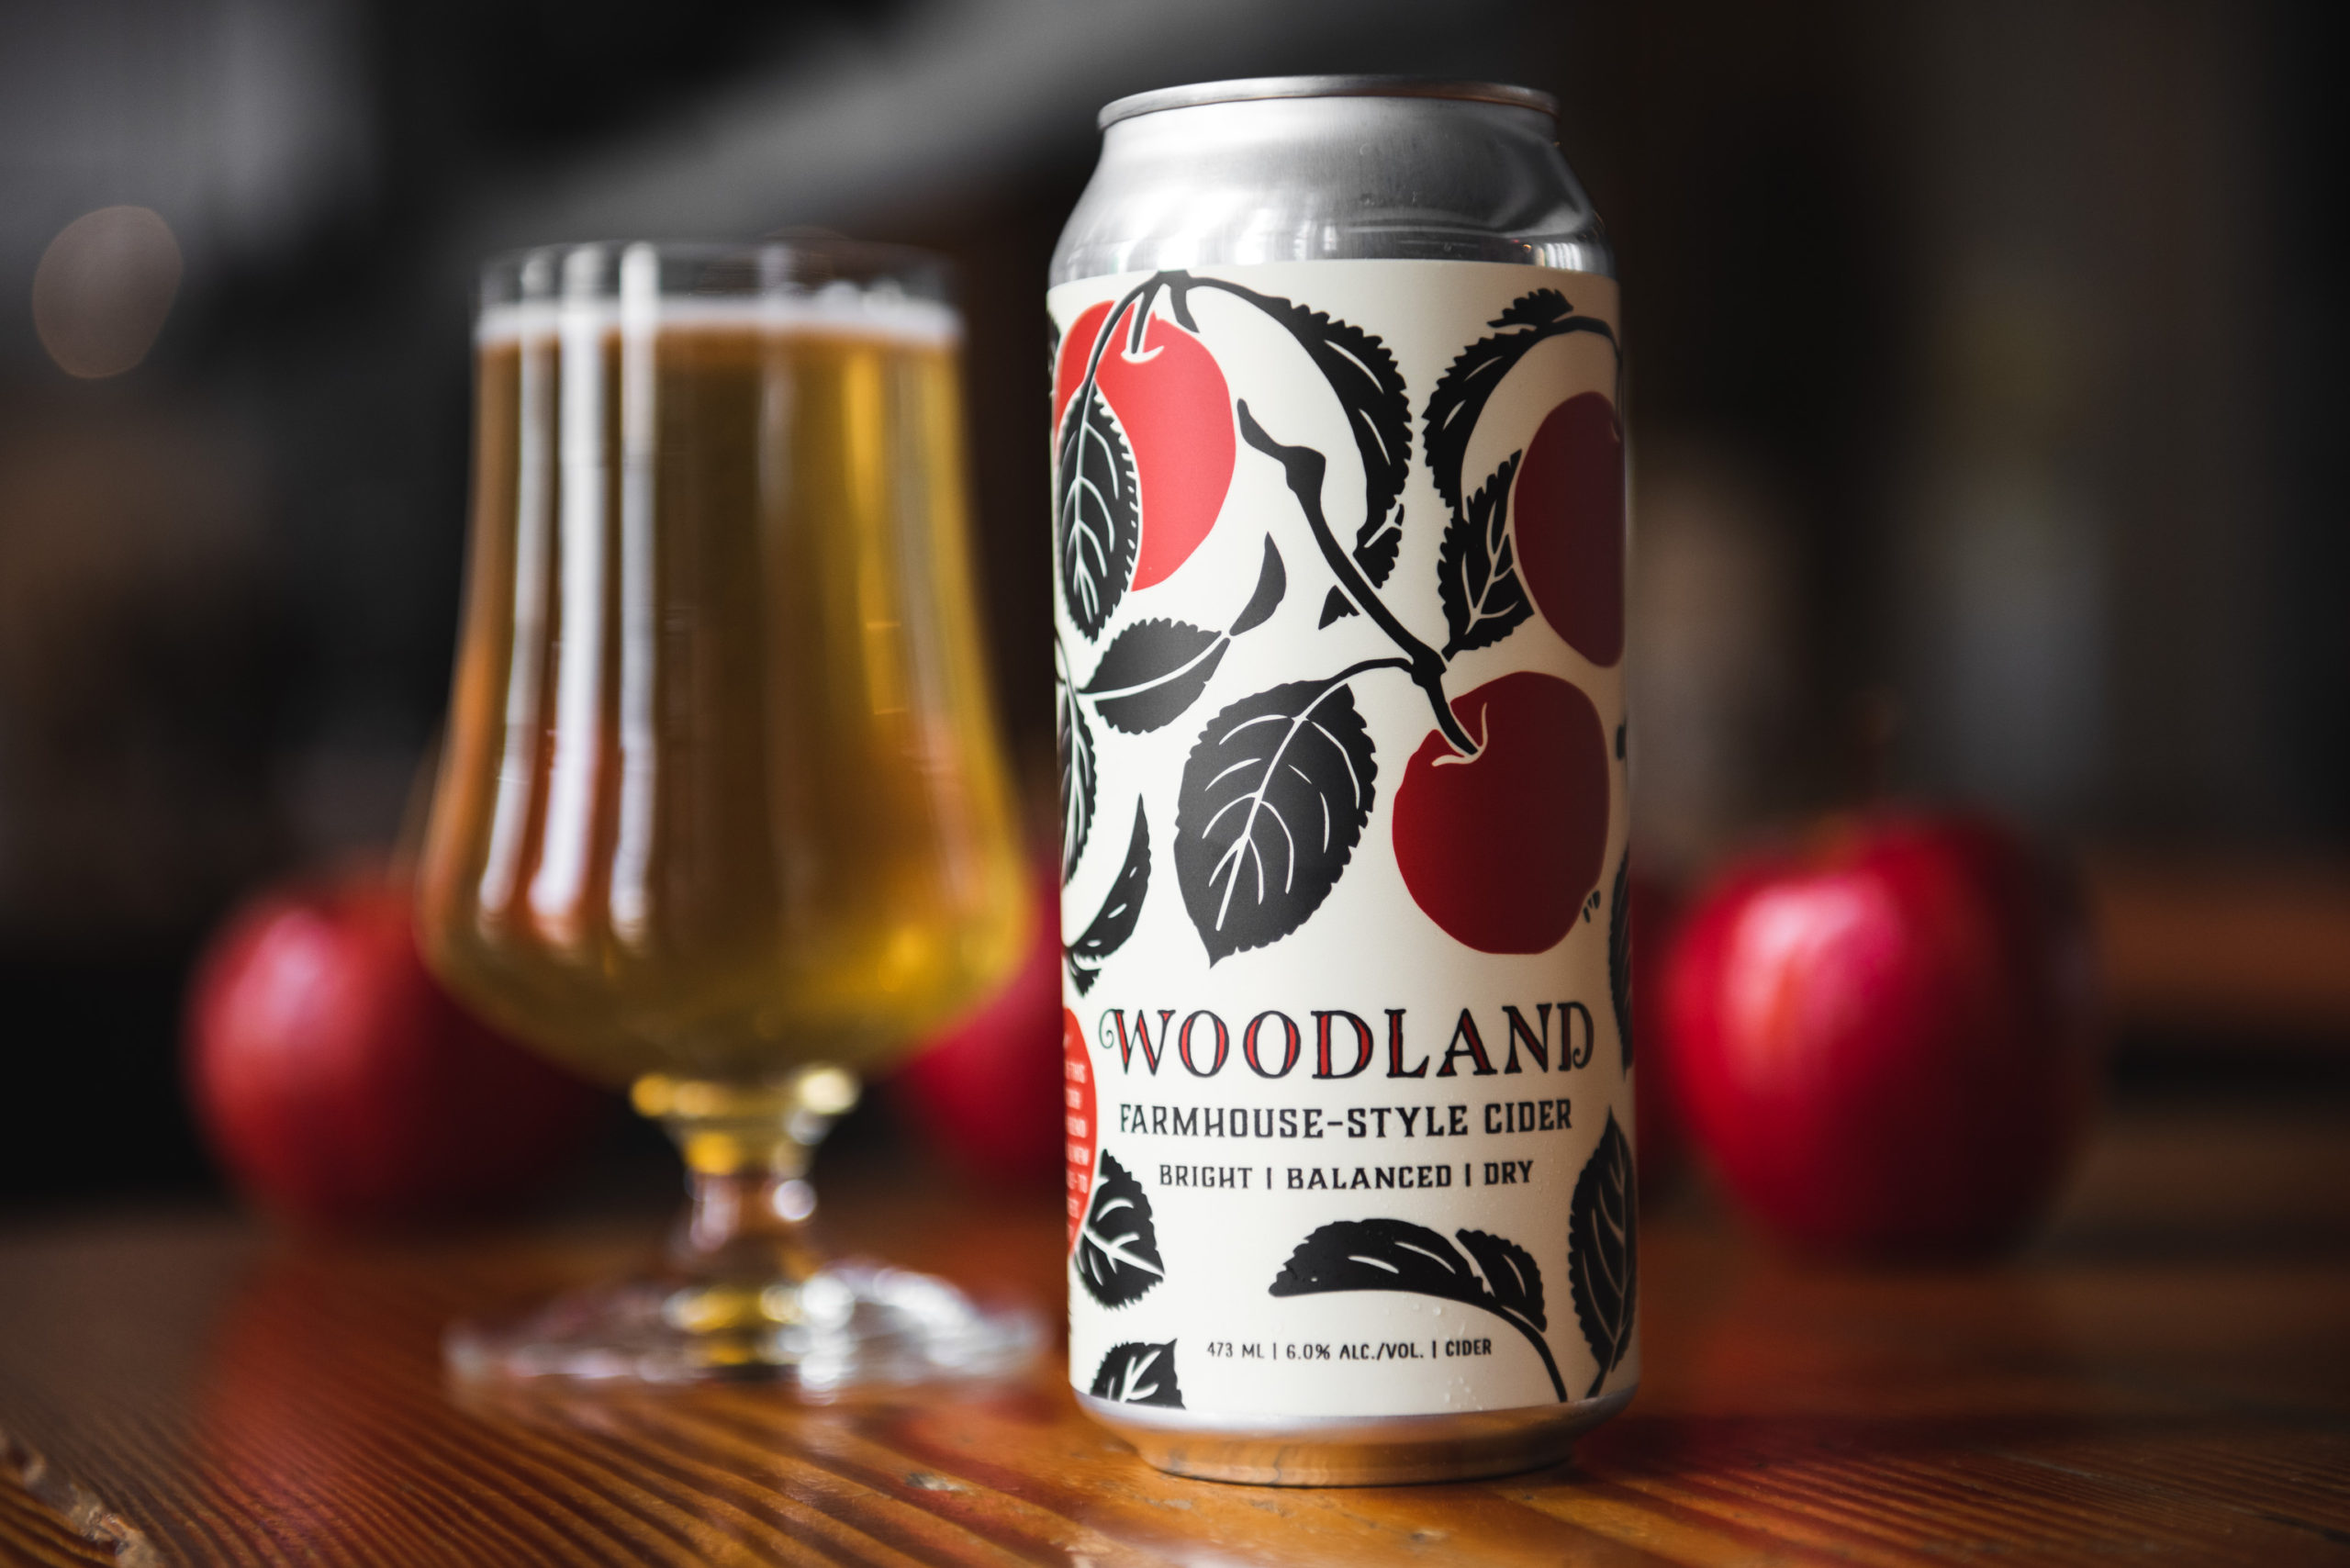 Woodland Farmhouse Cider